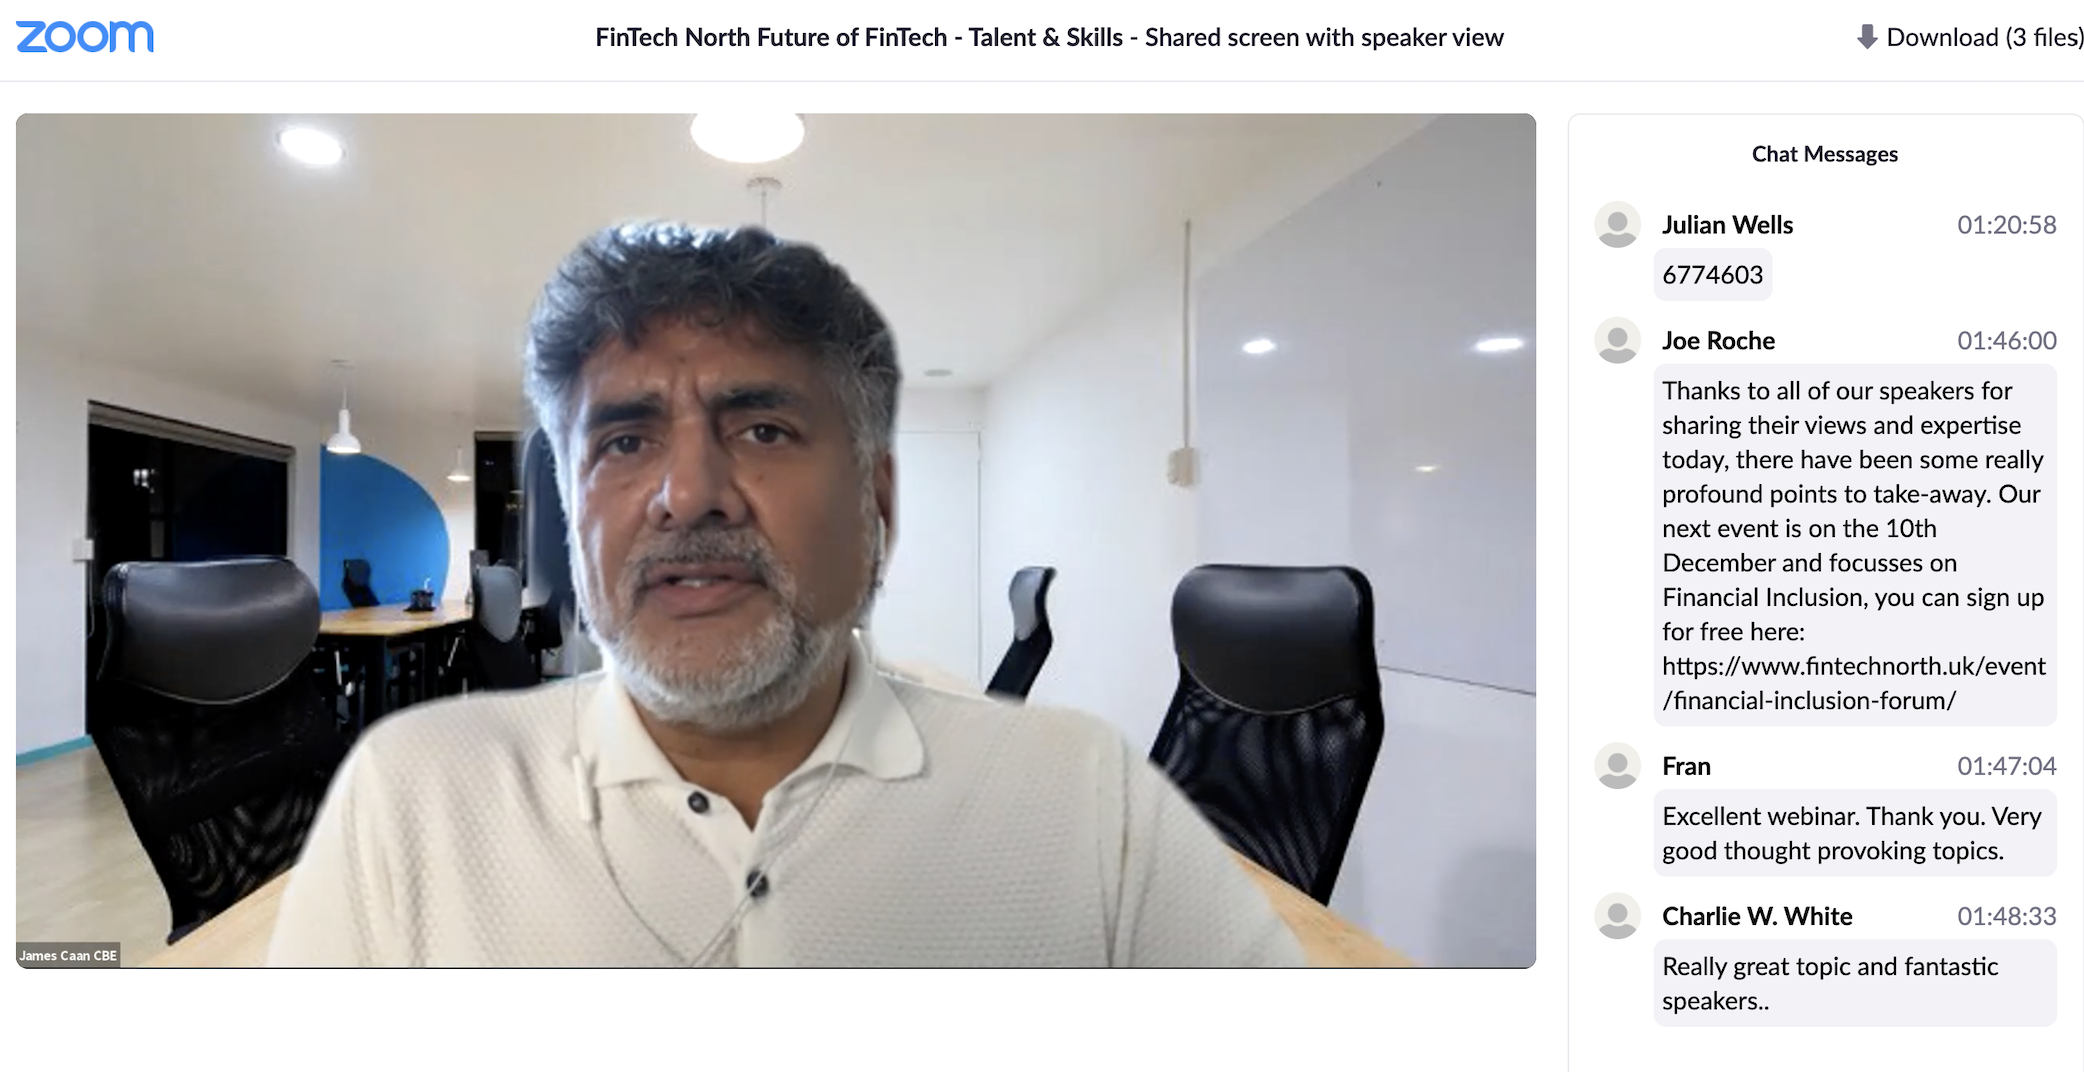 Re-watch: Future of FinTech – Talent & Skills 26/11